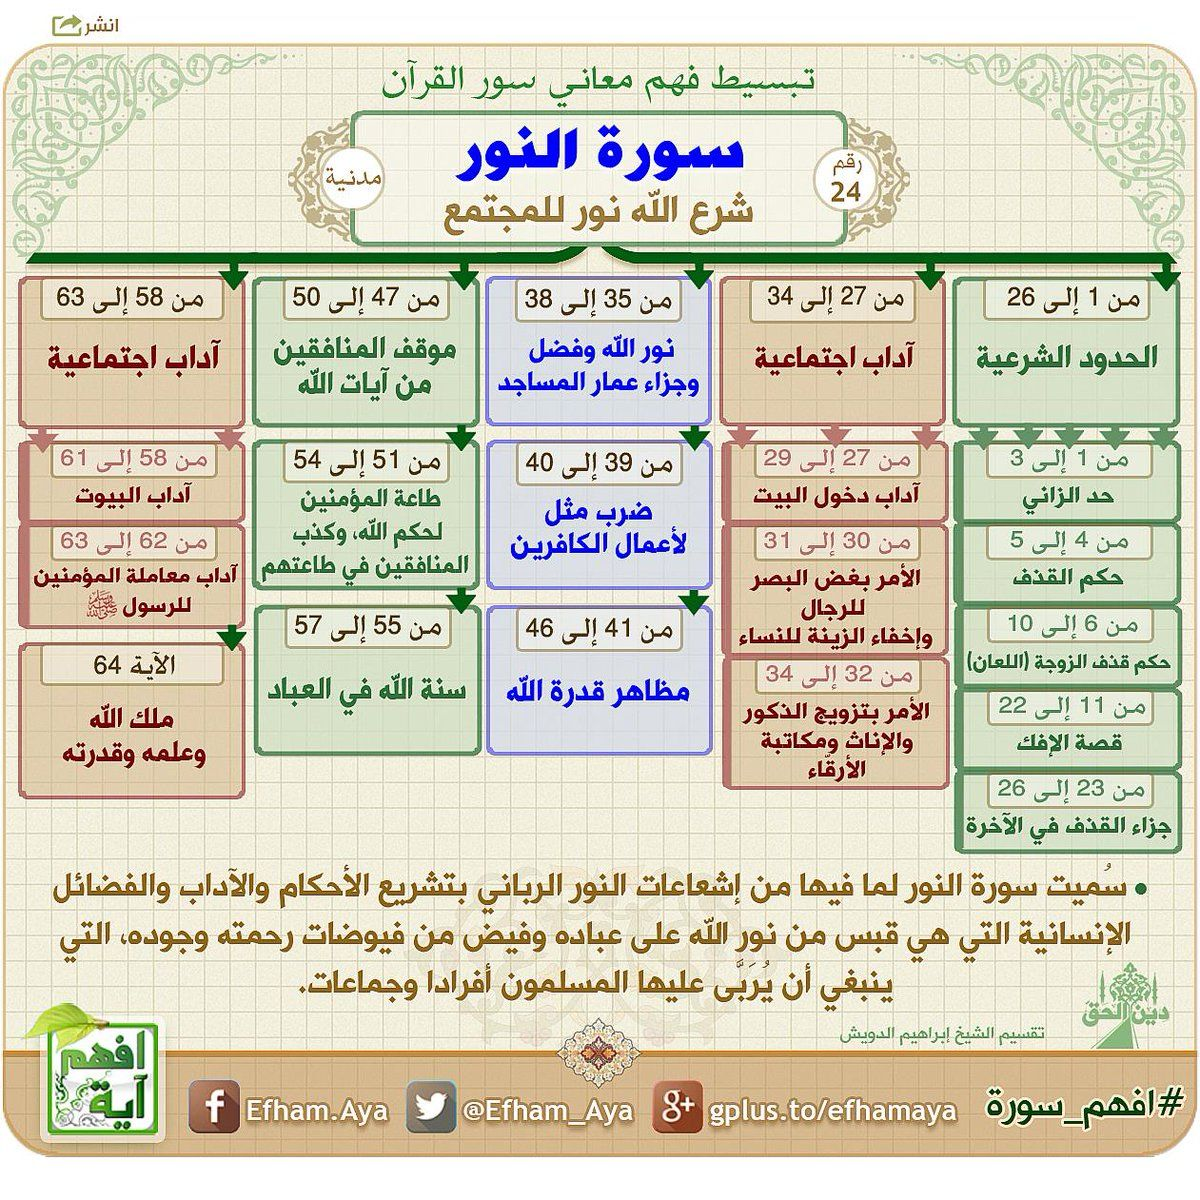 Pin Von Zahra Banoo Auf سورة البقرة Koran Buch Jga Lol